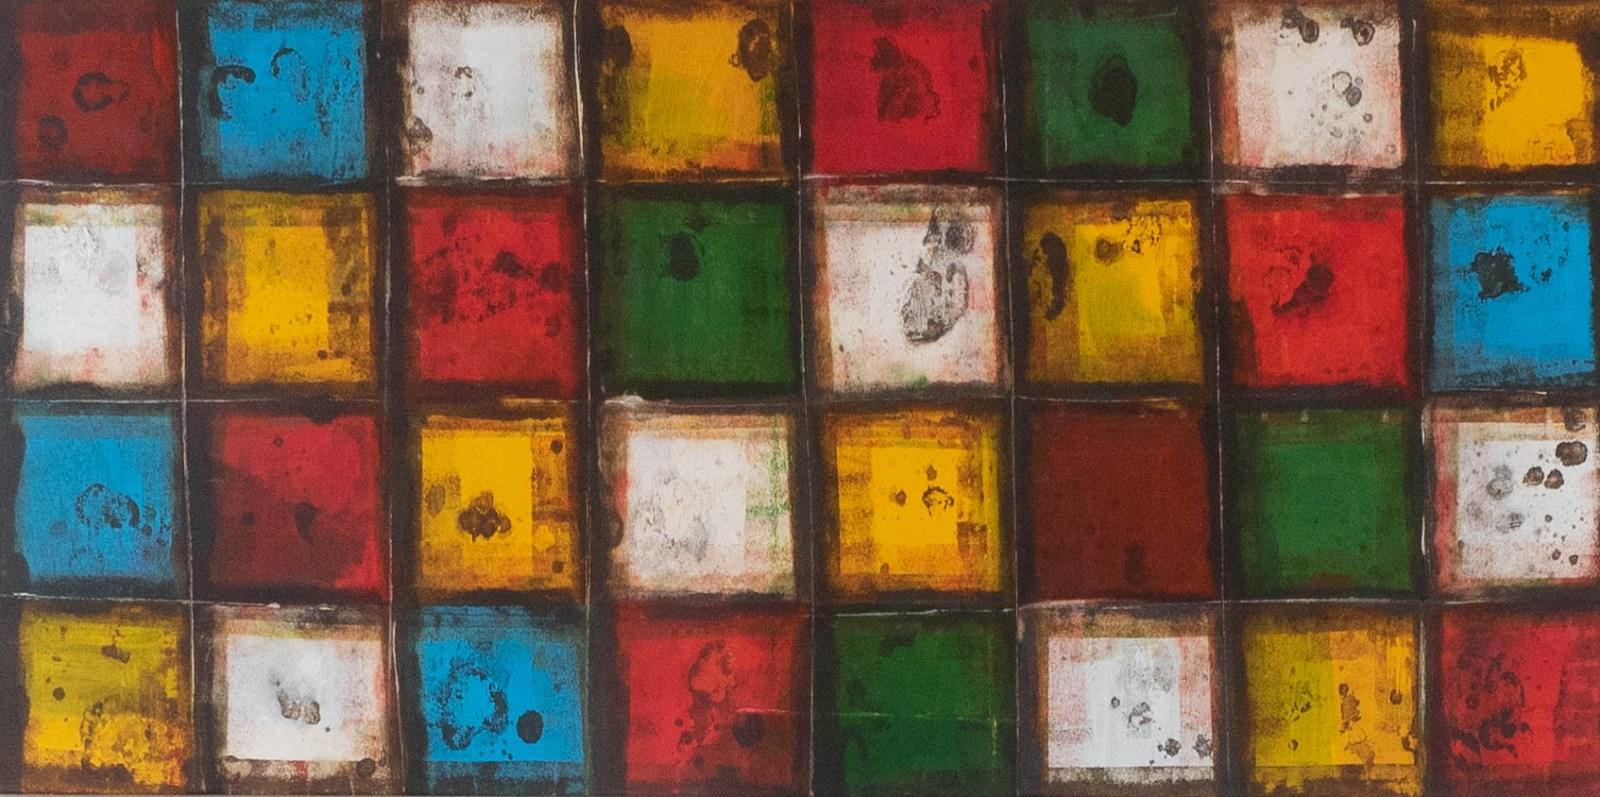 Acrylbild 'Light Windows' - 180 x 90 cm